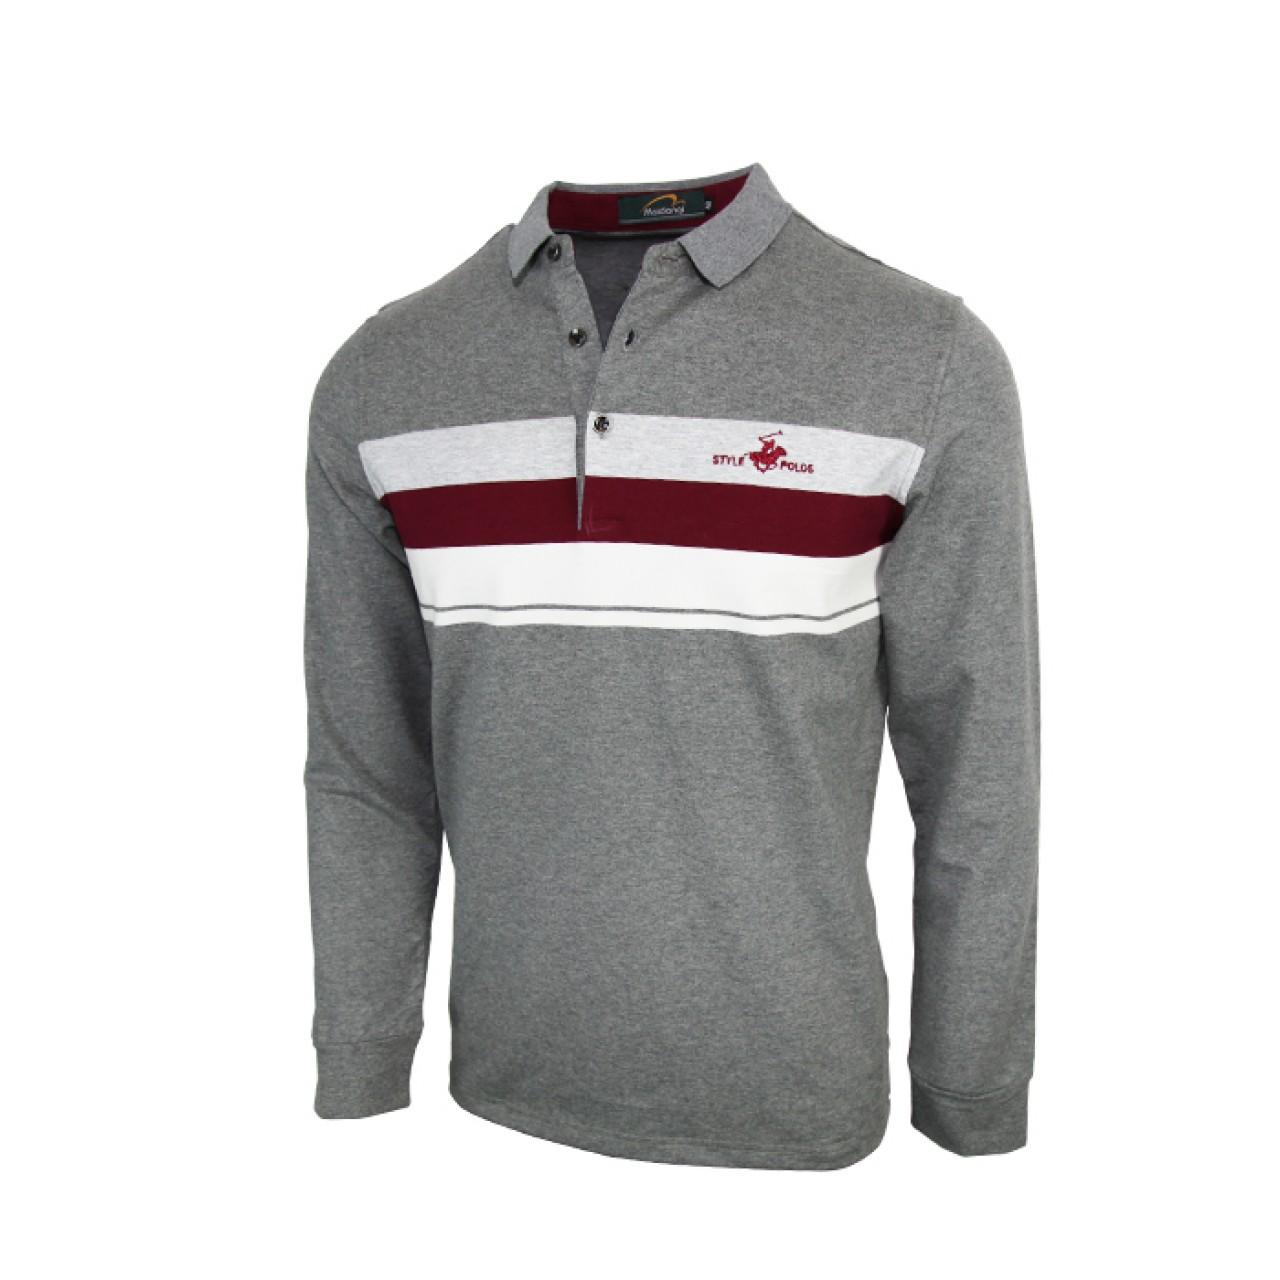 Men's Classic Grey Long Sleeve Polo Shirt